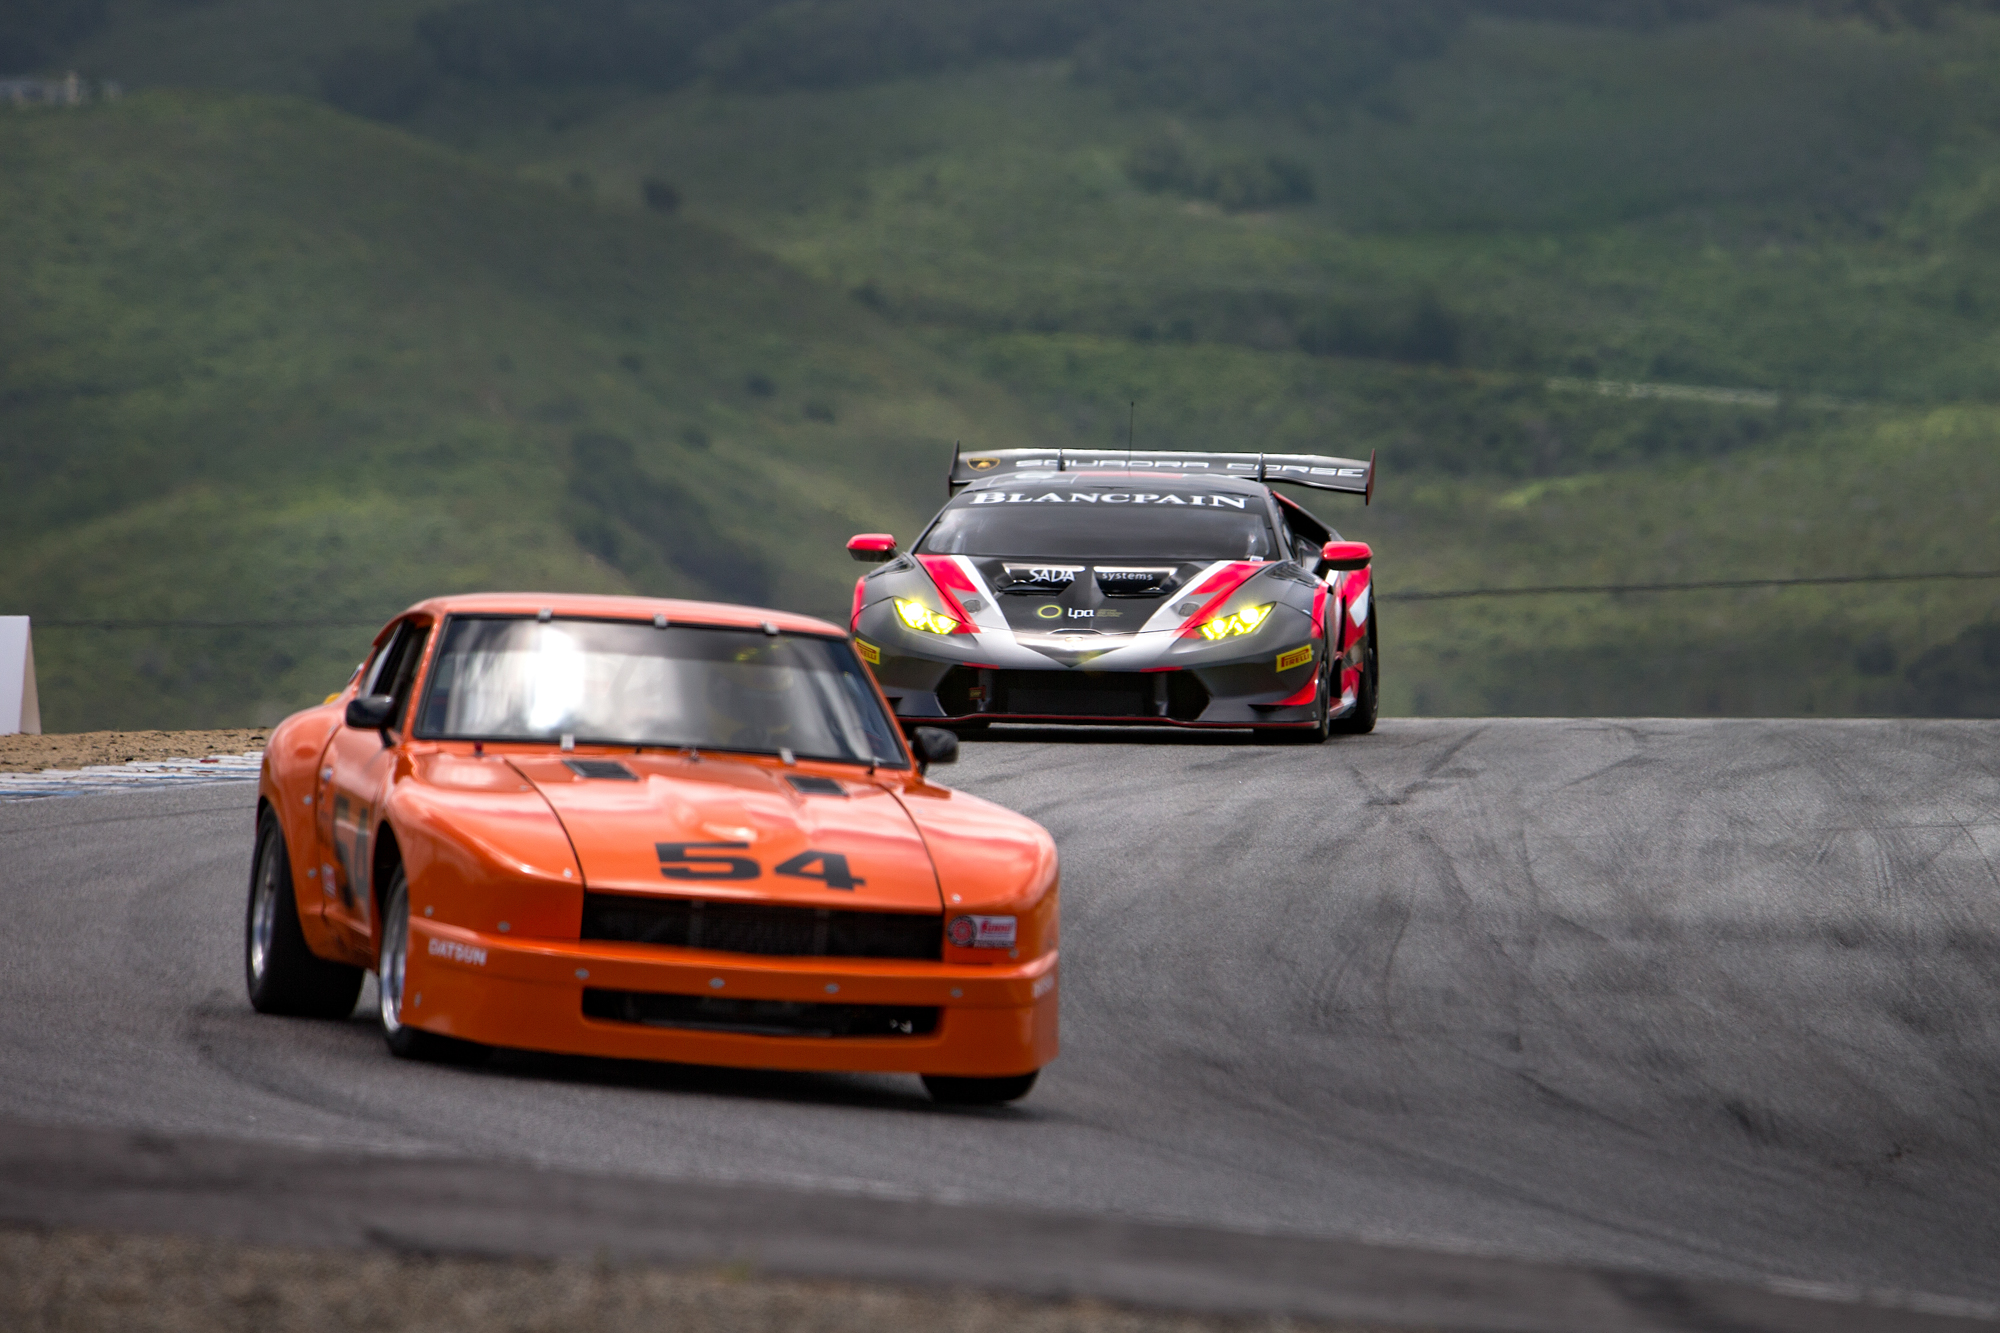 Steven-Racing-Laguna-20180531-96162.jpg